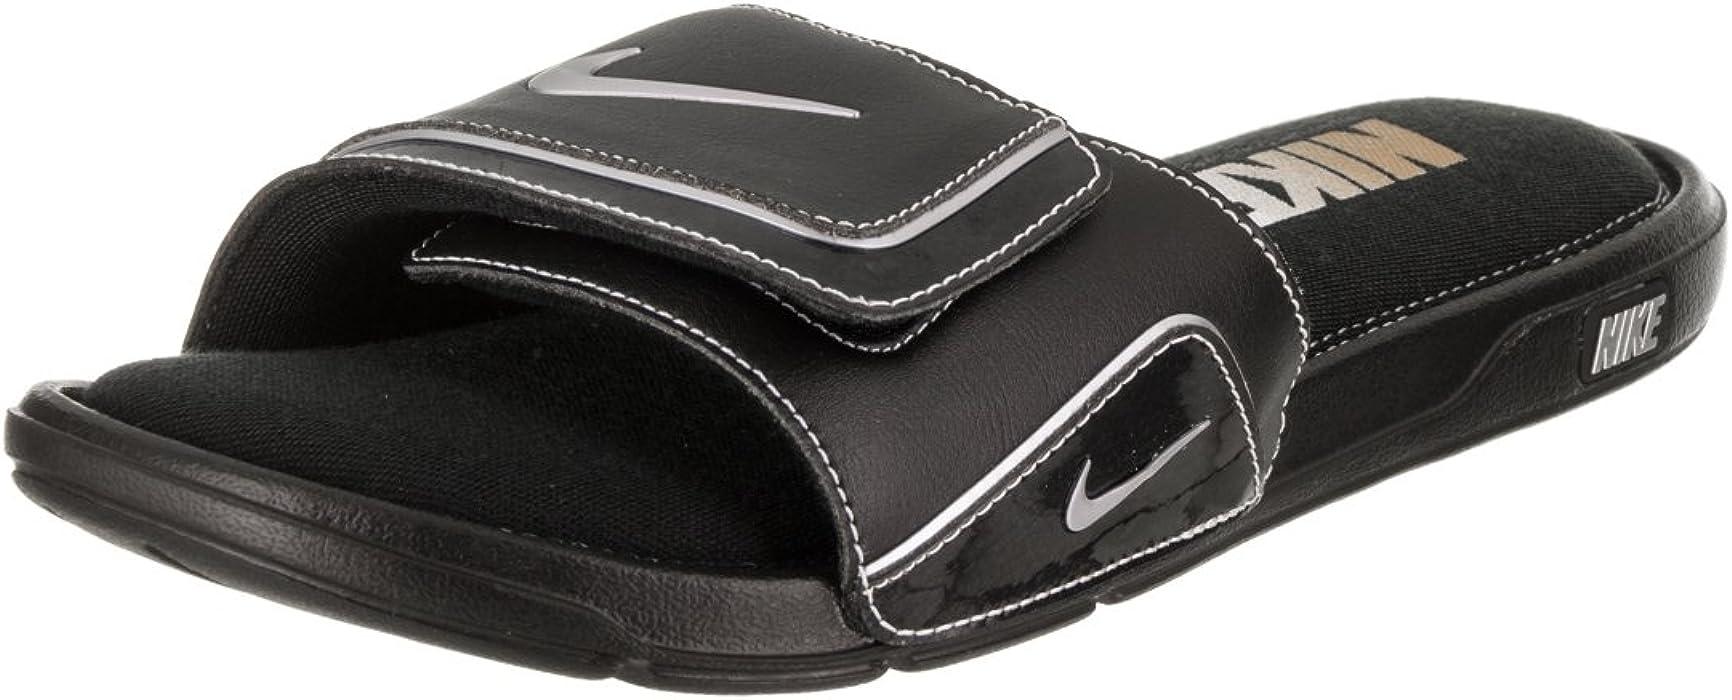 68dc5595ccf Nike Comfort Slide 2 Sandal  Amazon.co.uk  Clothing